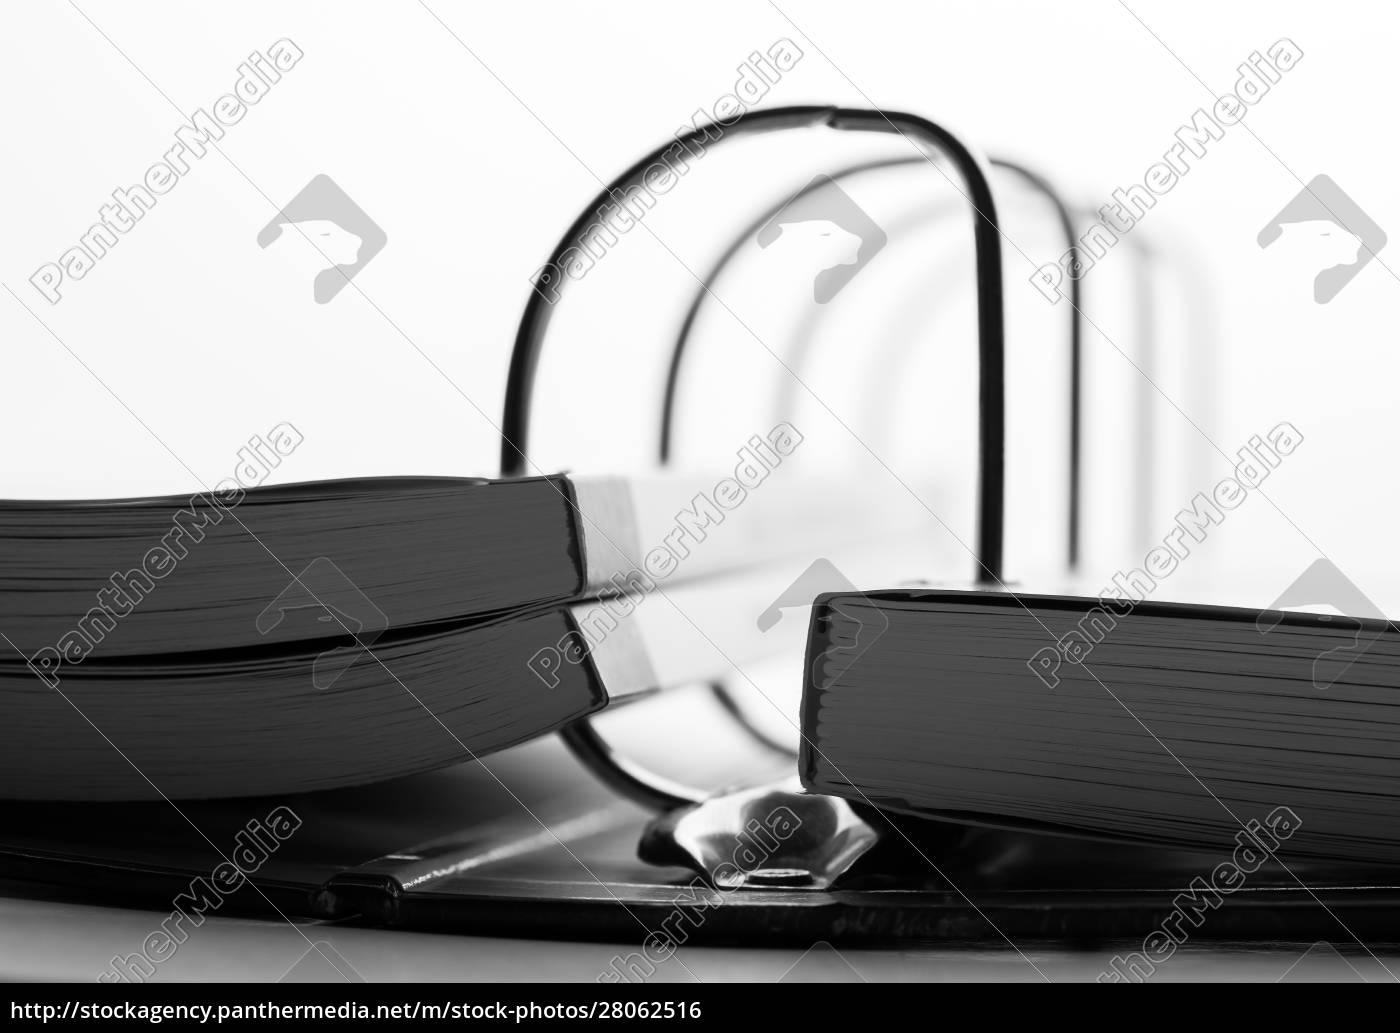 file, folder - 28062516